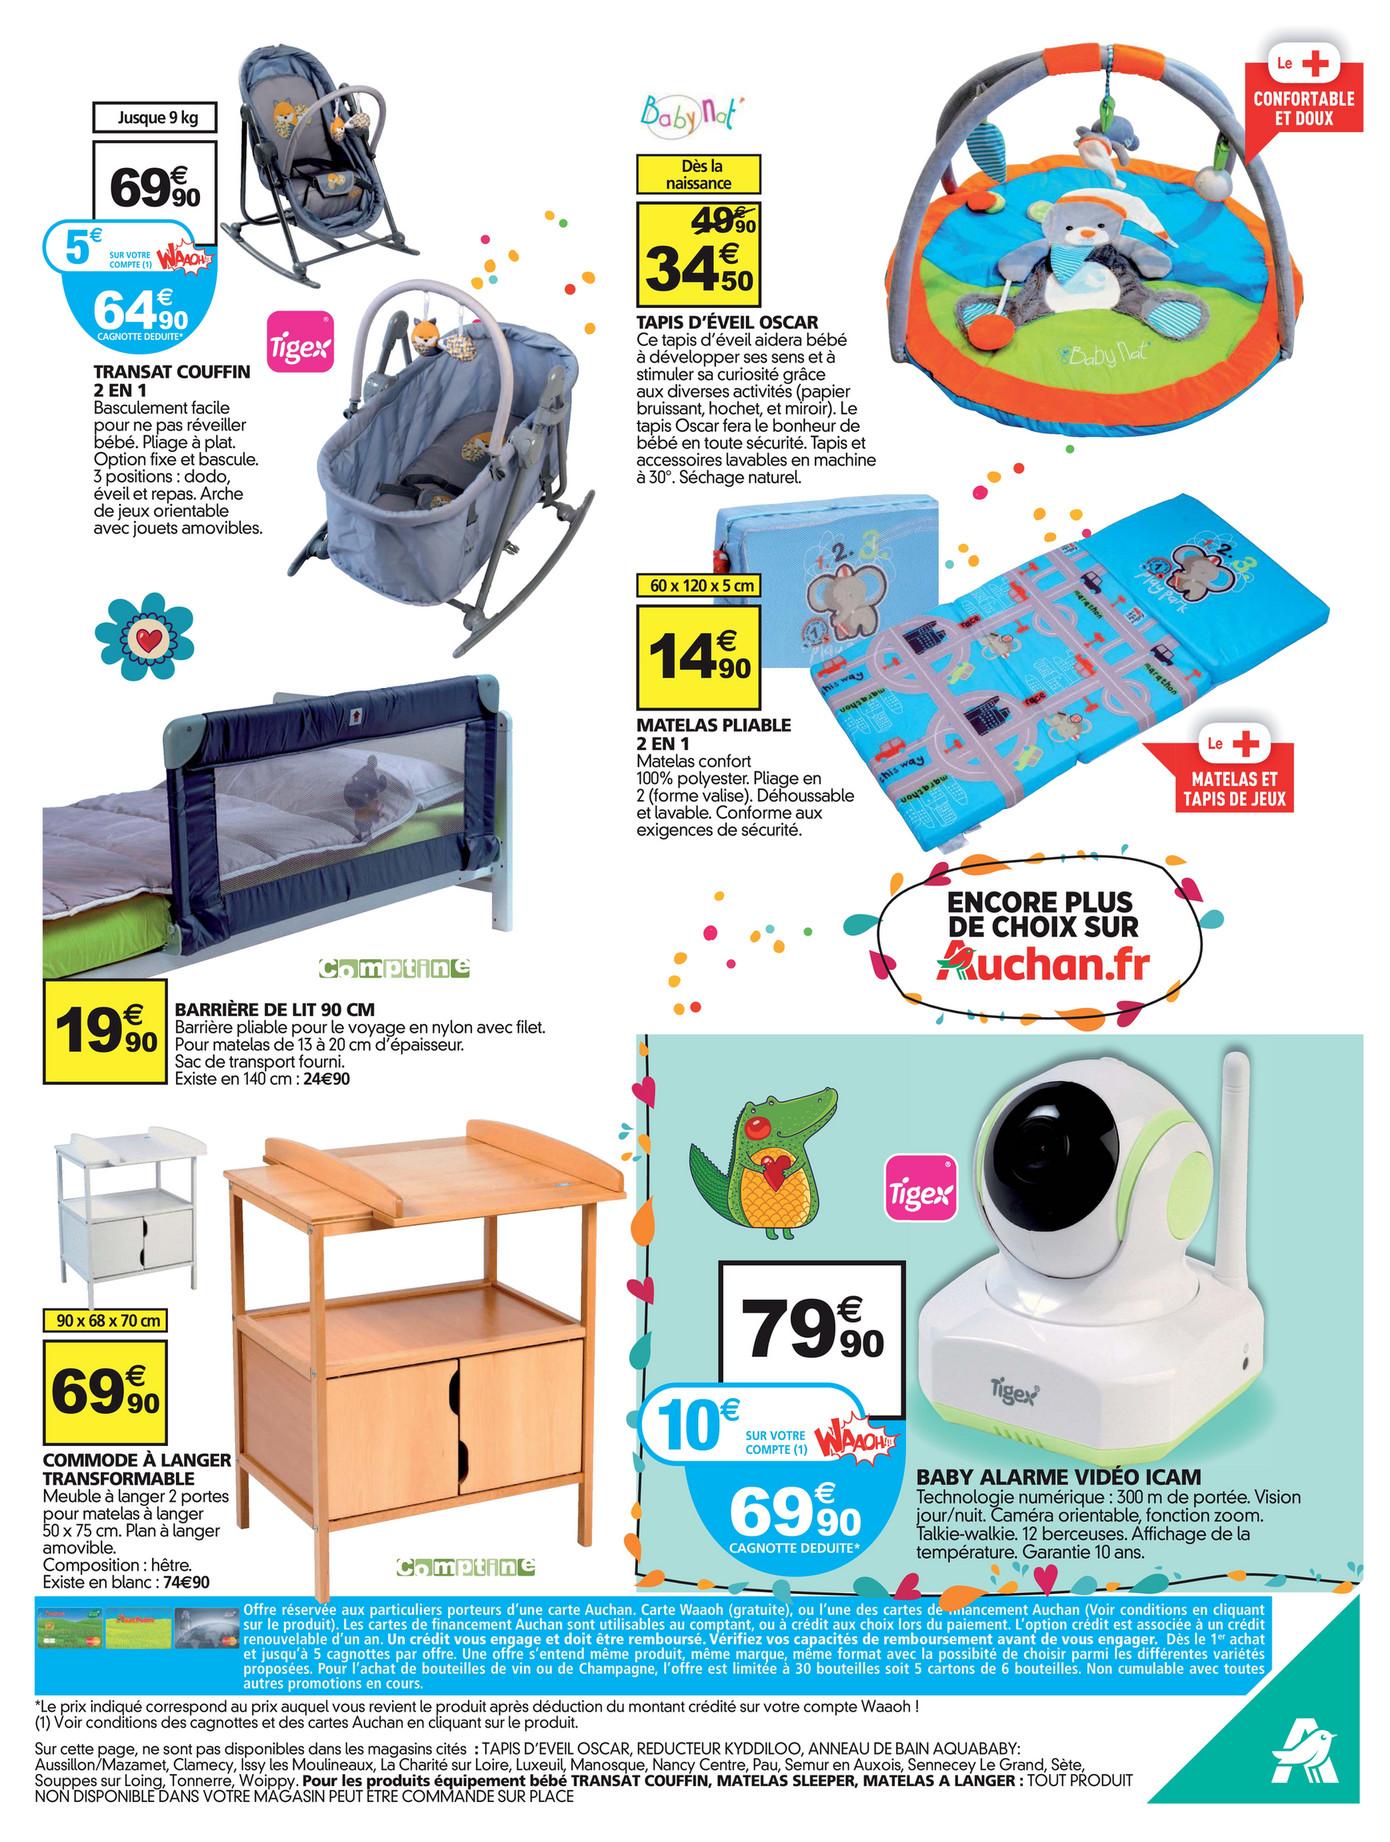 folderaanbiedingen auchan baby folder 18 tm 24 januari 2017 pagina 10 11. Black Bedroom Furniture Sets. Home Design Ideas